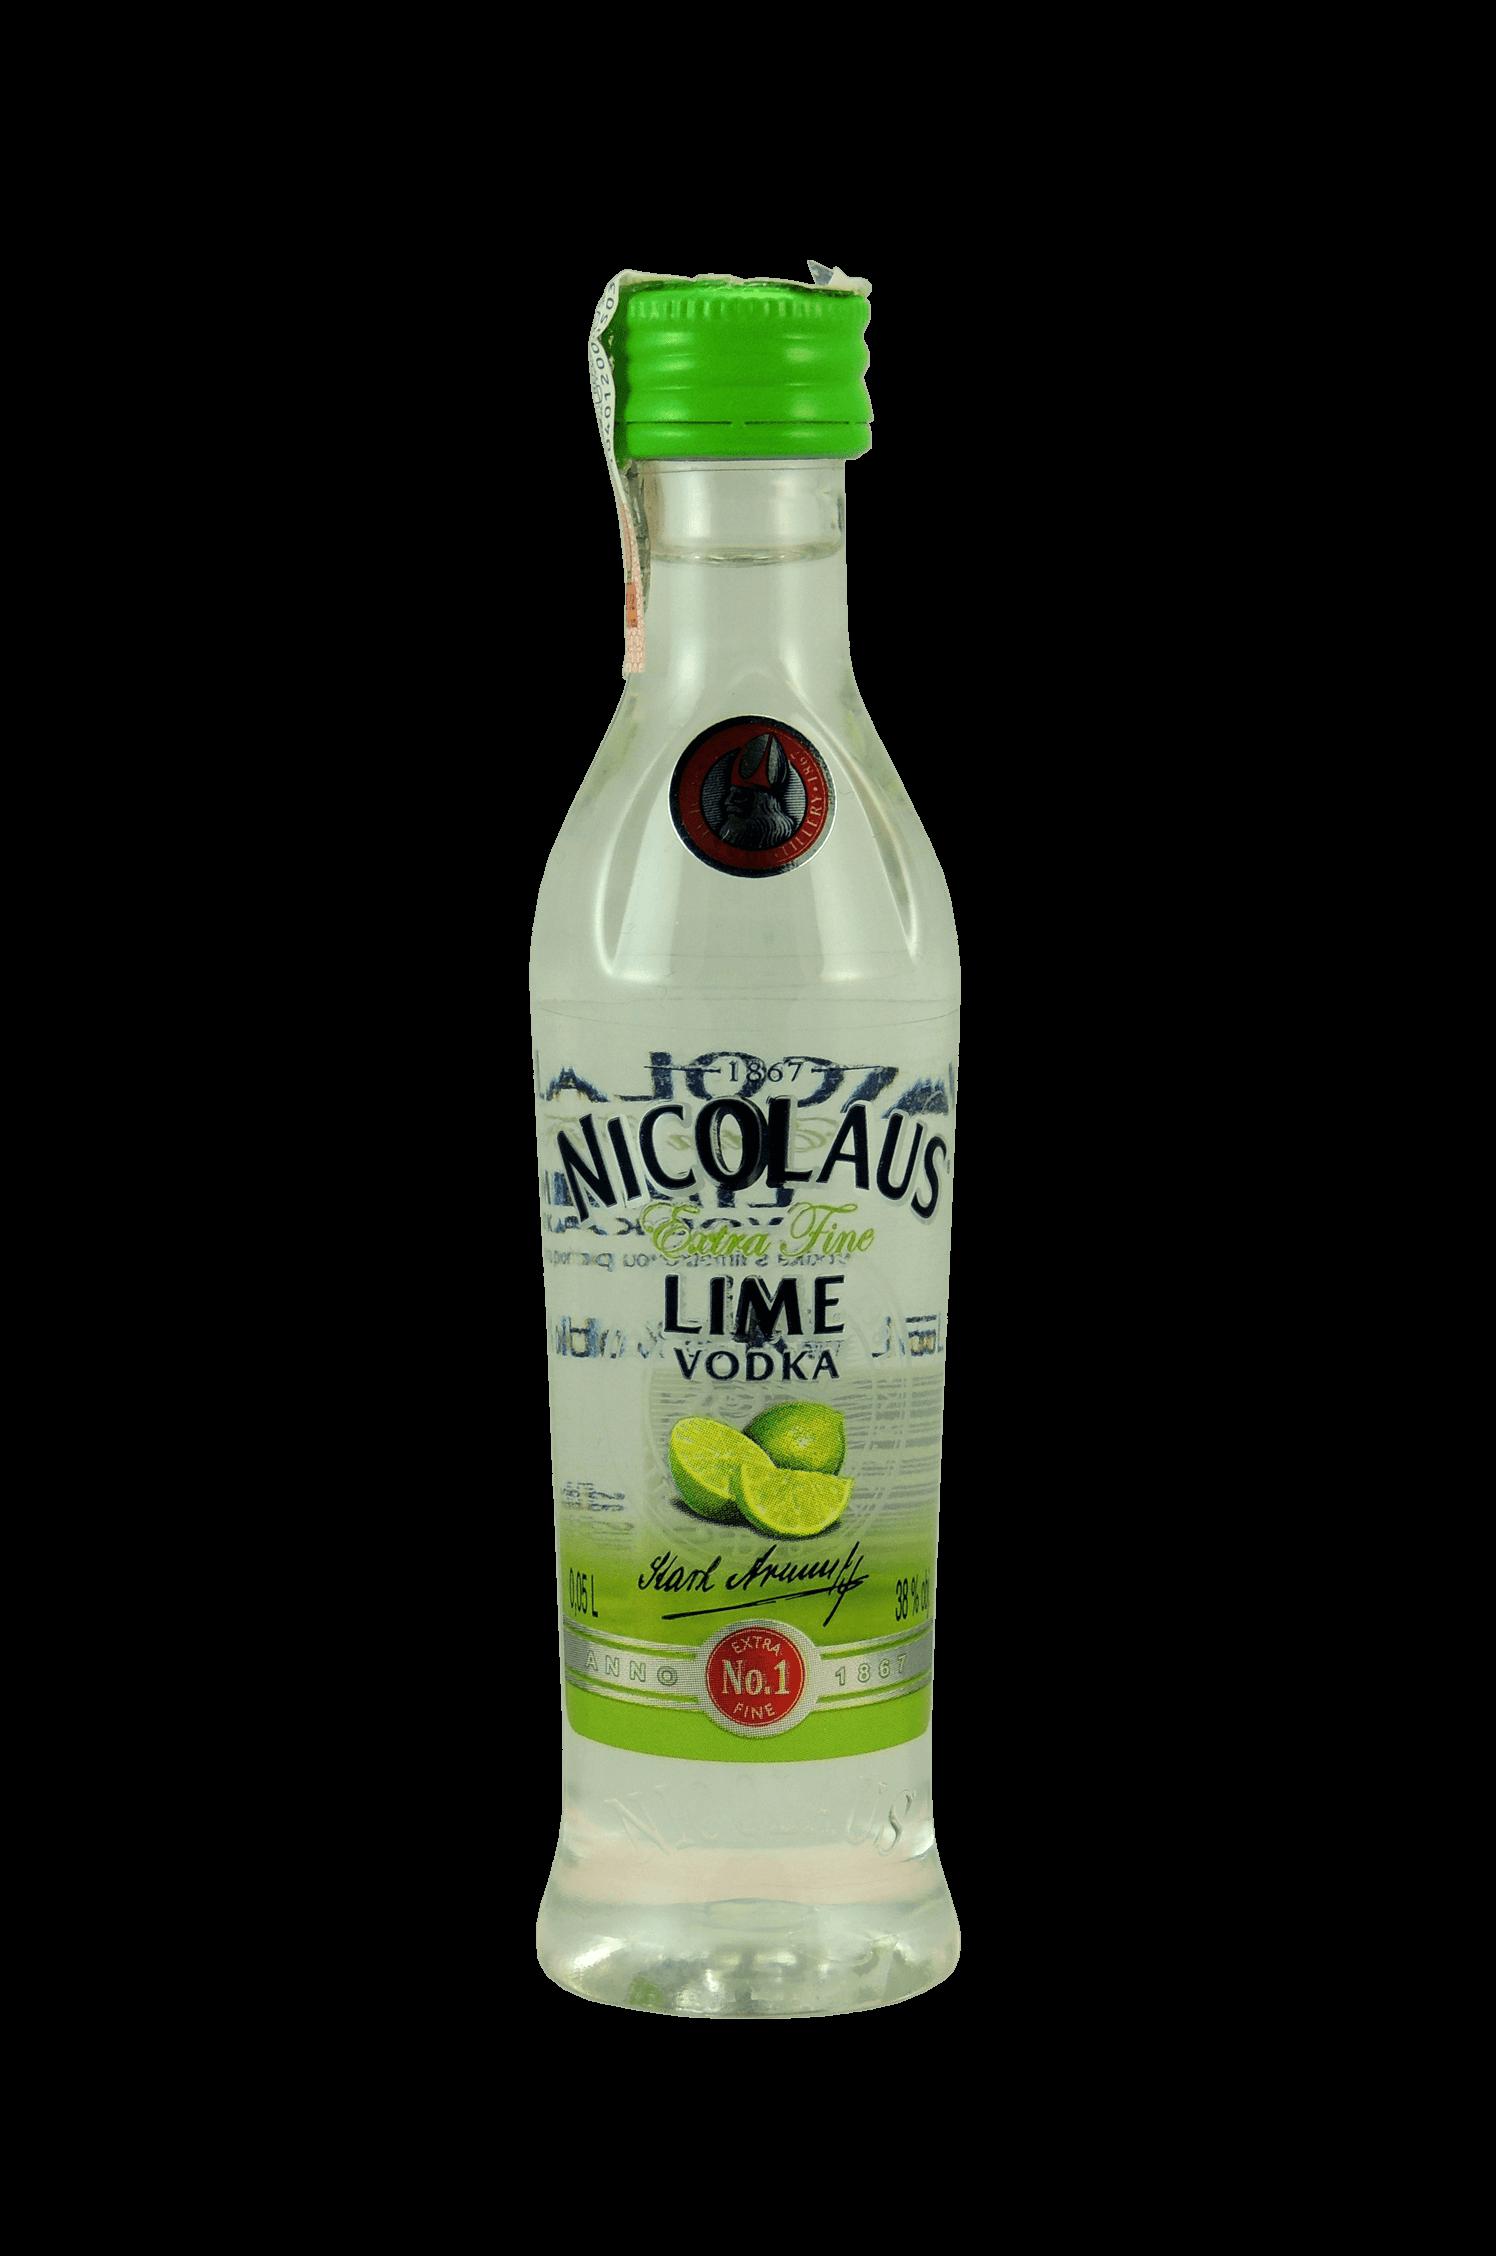 Nicolaus Lime Vodka